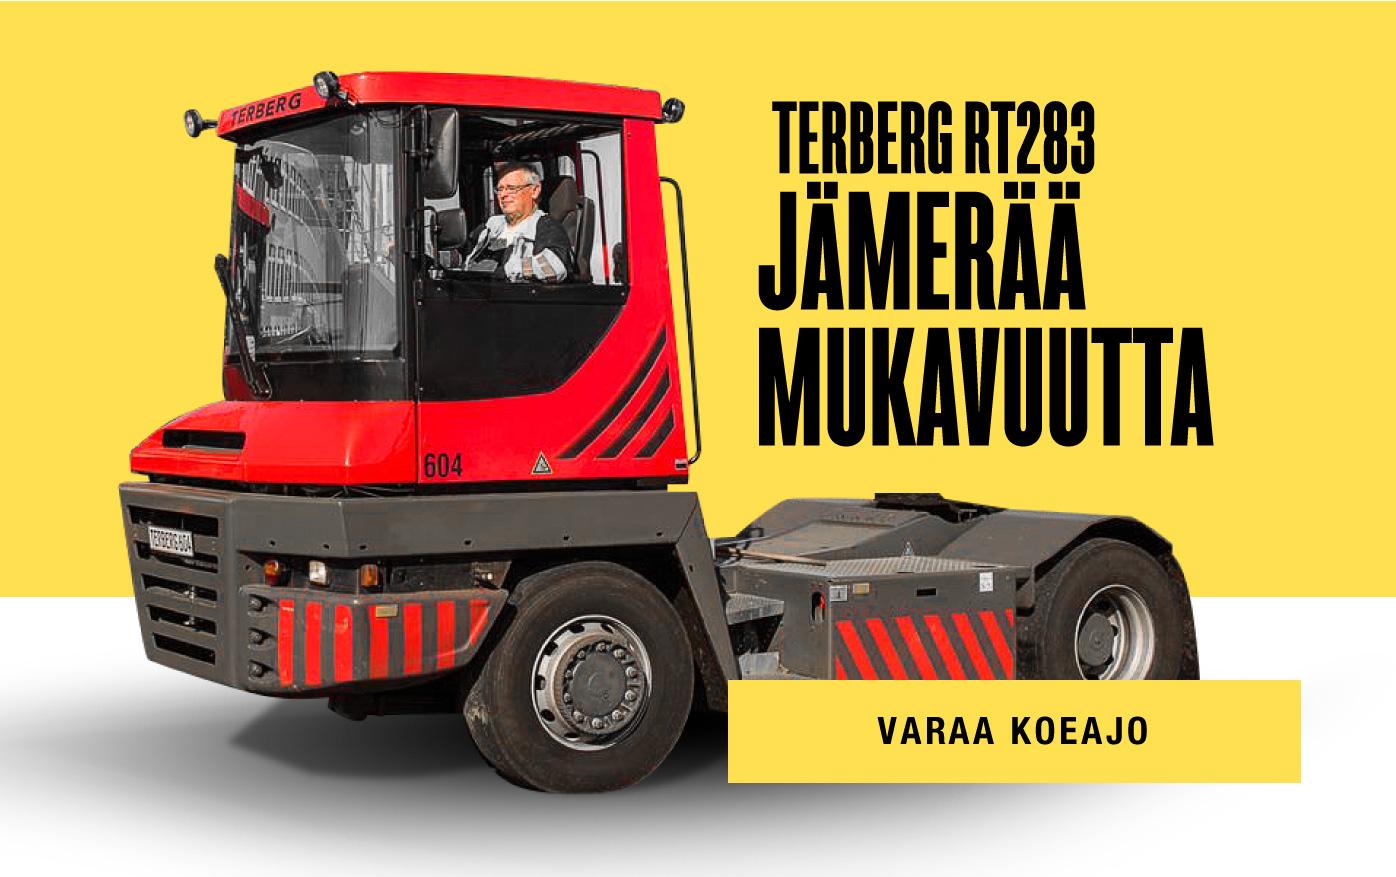 Tervetuloa koeajamaan Terberg RT283